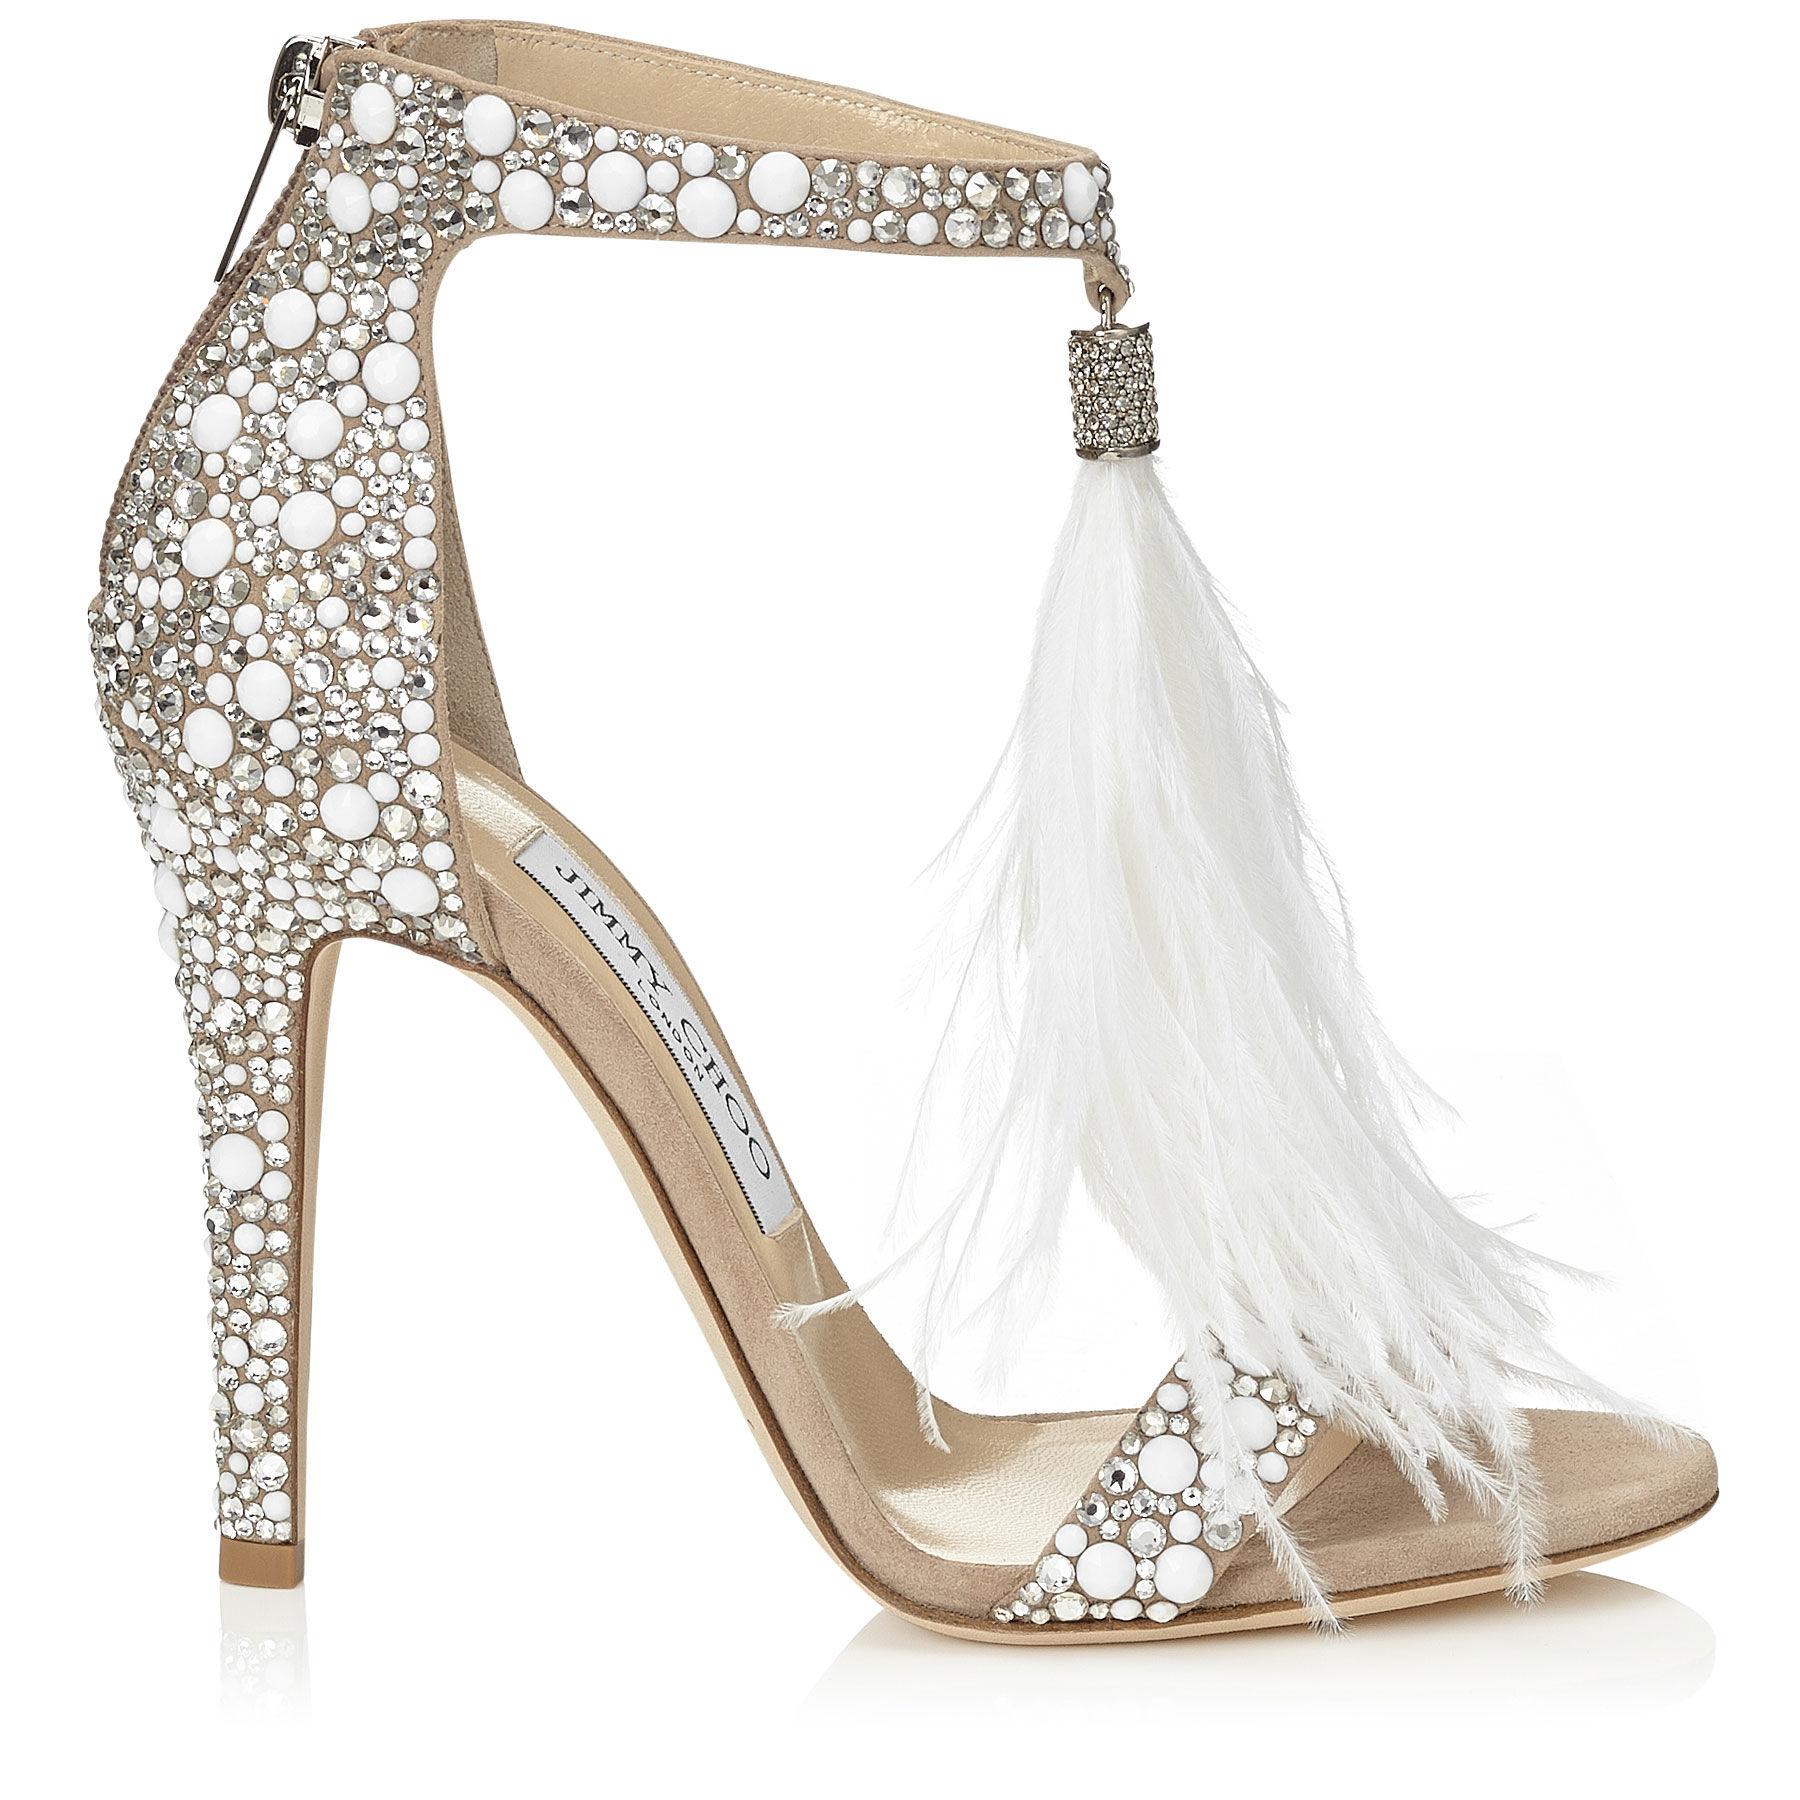 Favorite Bridal Shoe Picks for the 2019 Spring & Summer Wedding Seasons